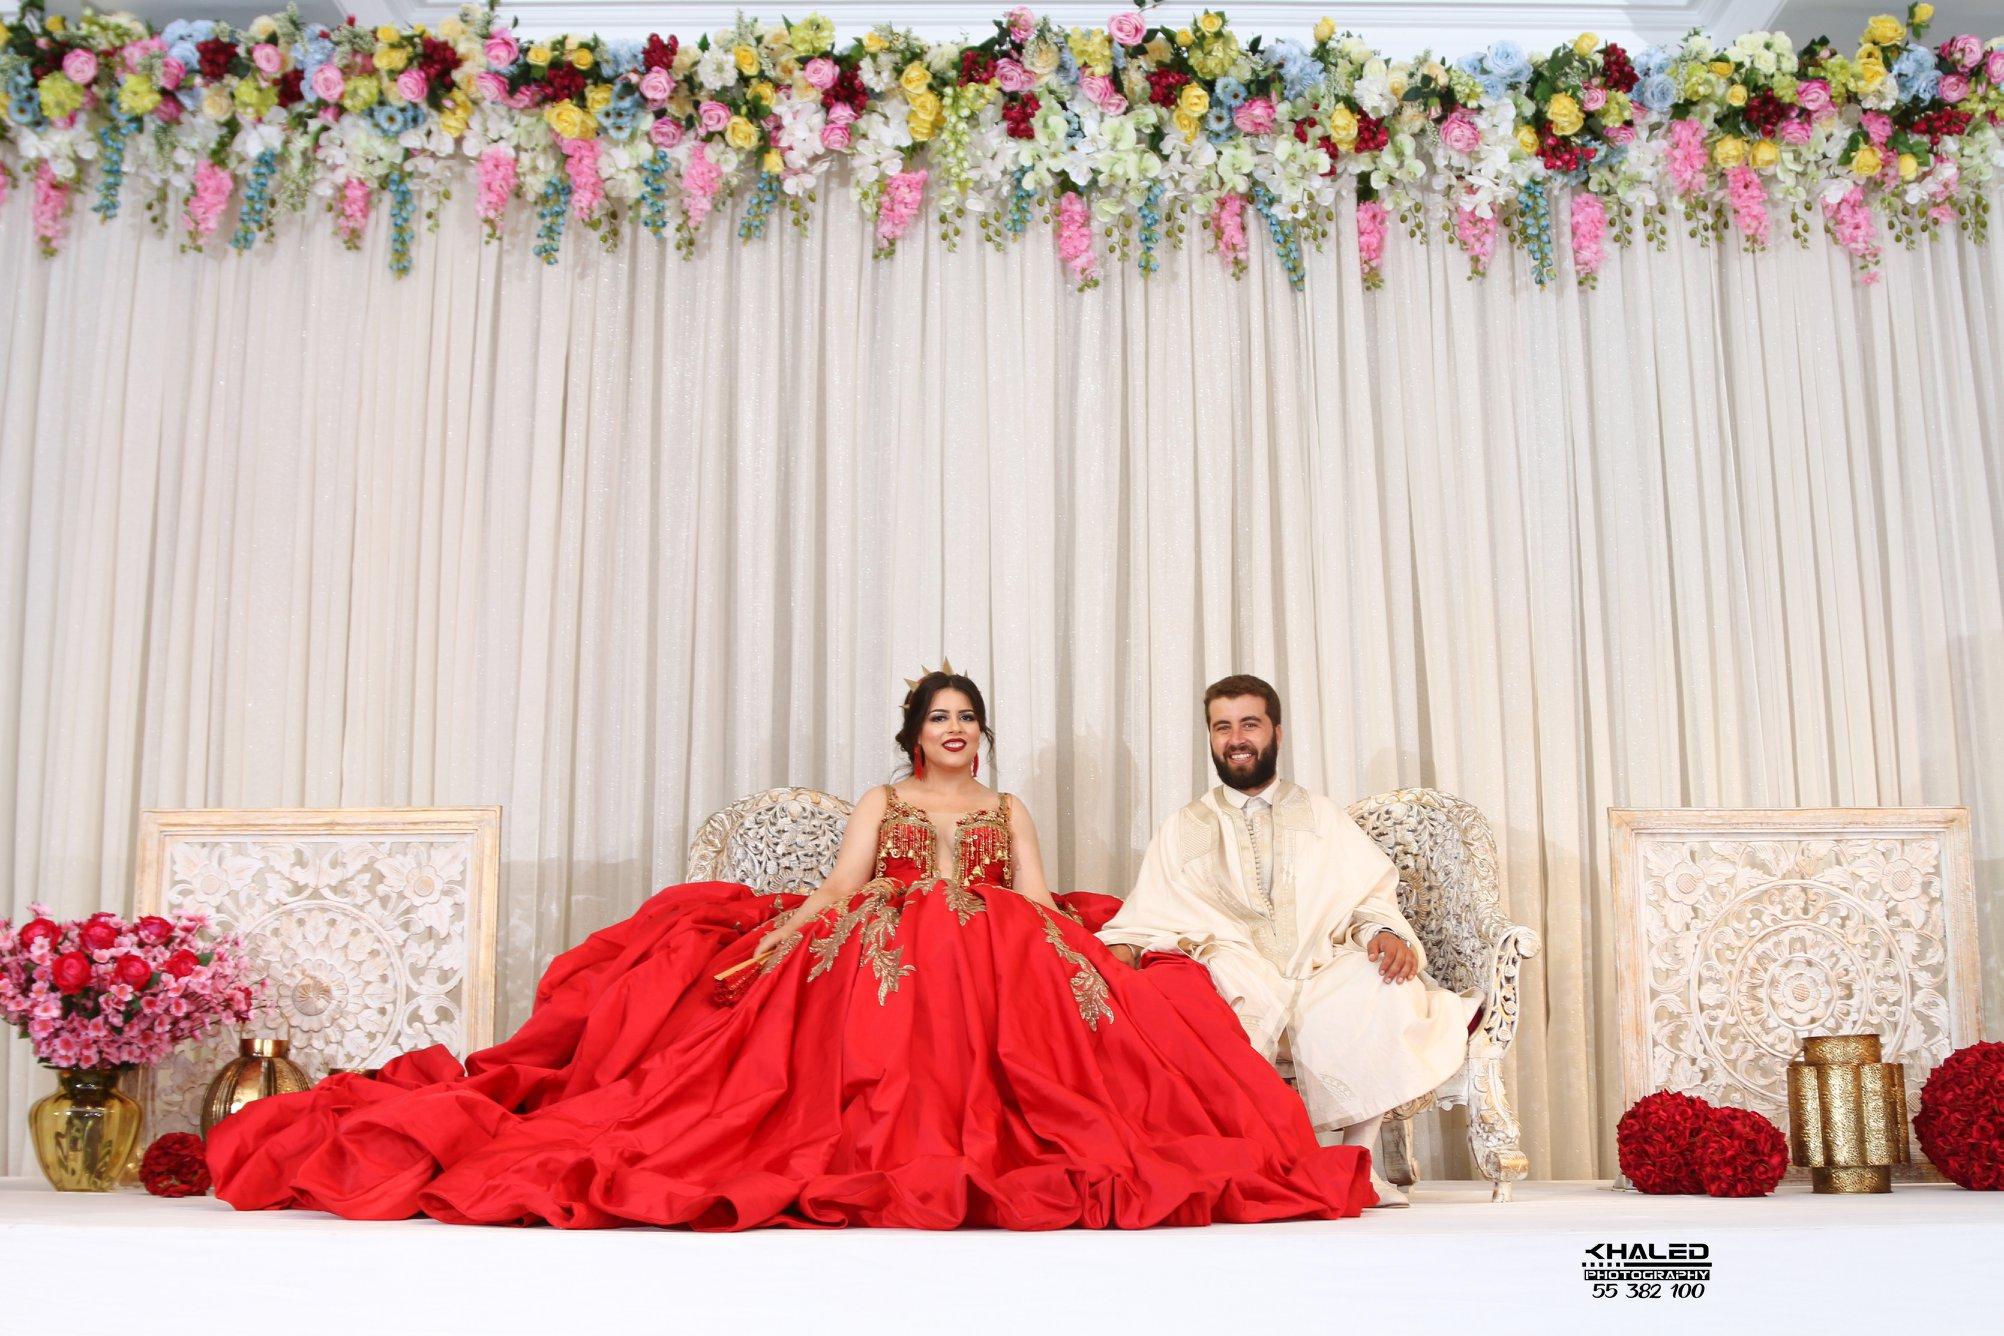 fida29_plus_belles_mariées_tunisiennes_186_2019